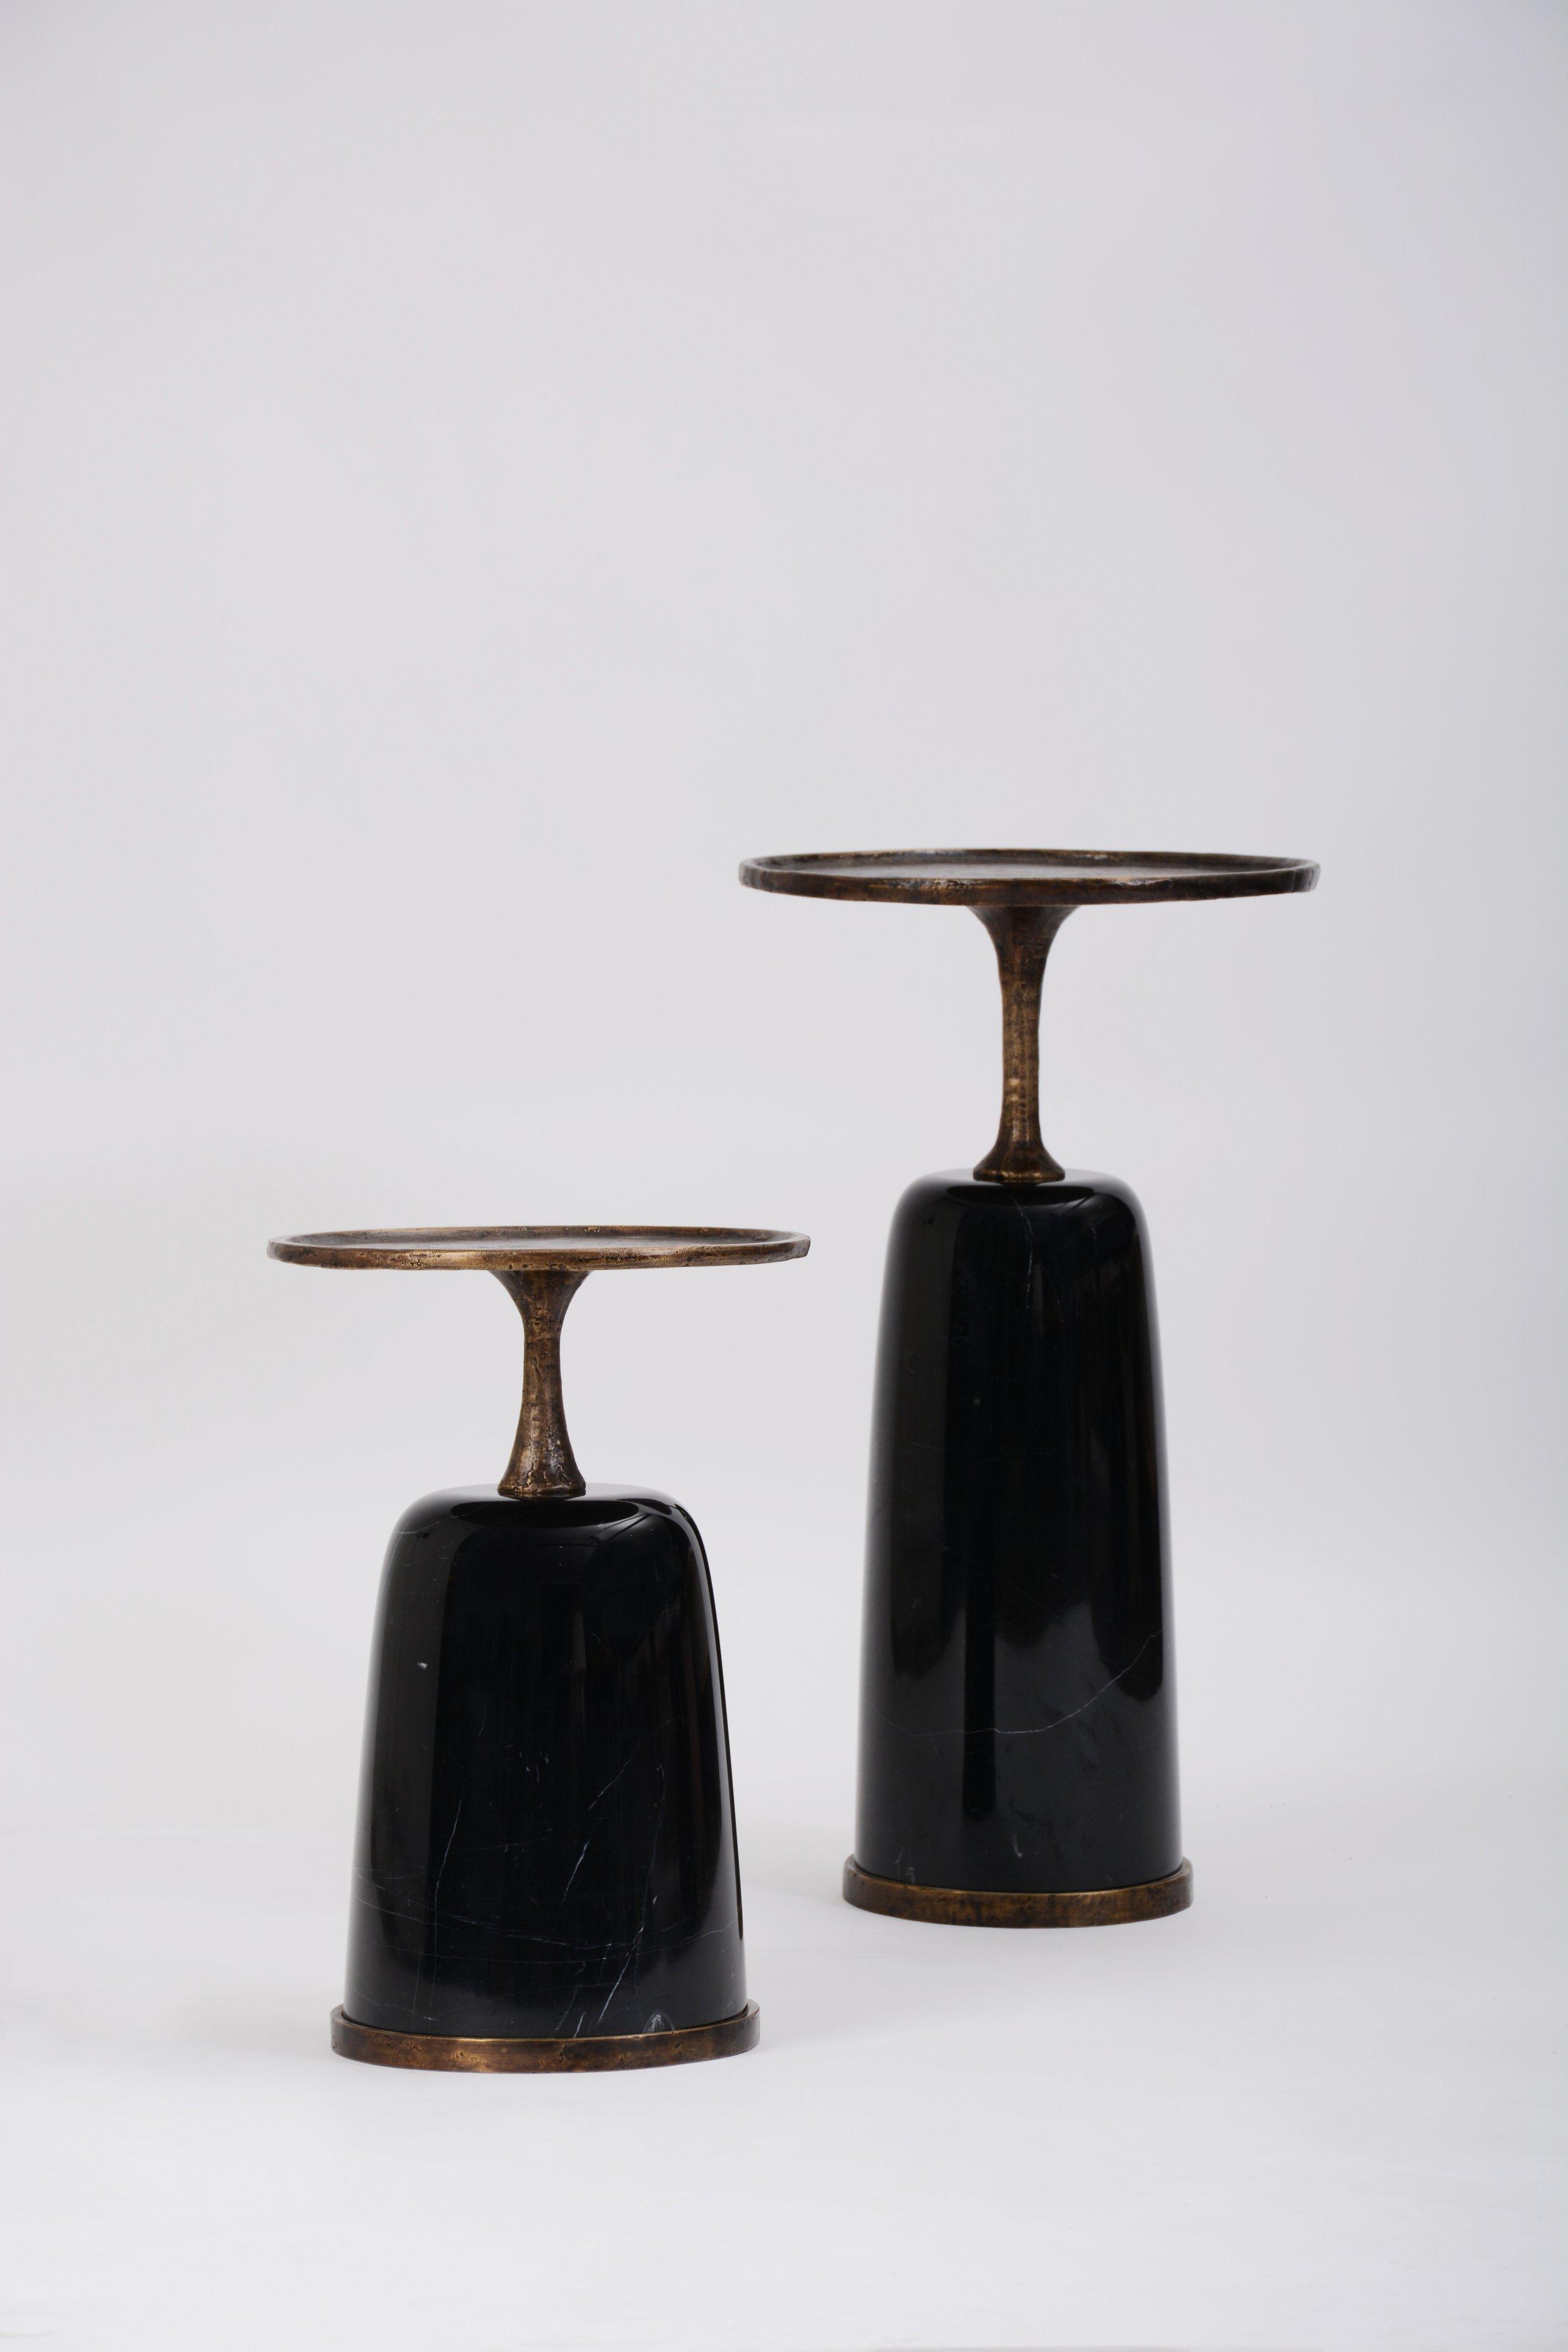 altai side table 4.JPG